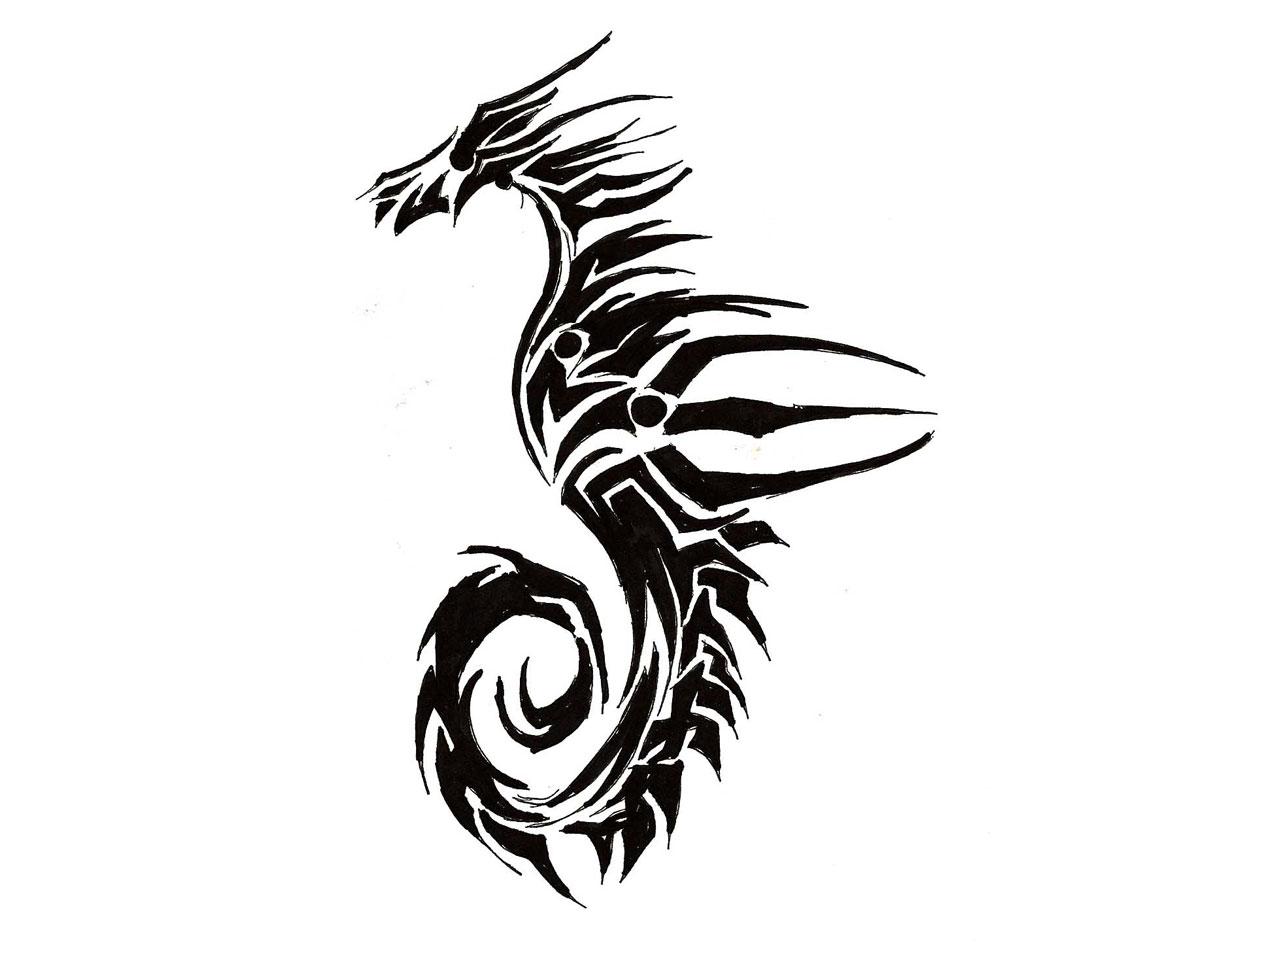 Seahorse Black And White